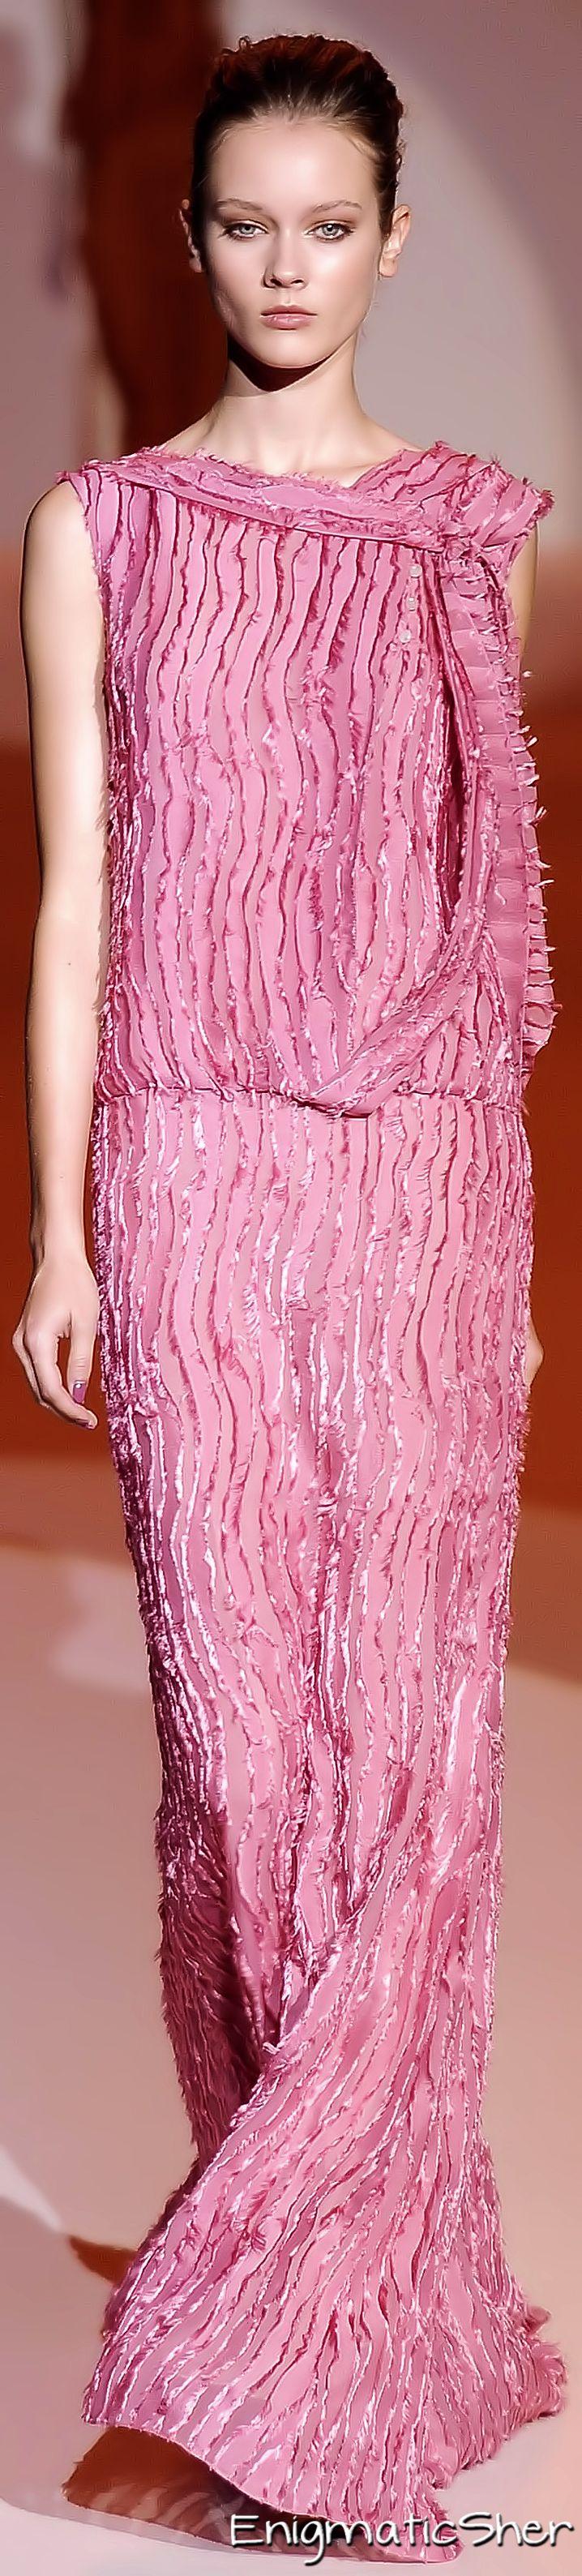 Carolina Herrera Spring Summer 2010 Ready-To-Wear | Ropa | Pinterest ...